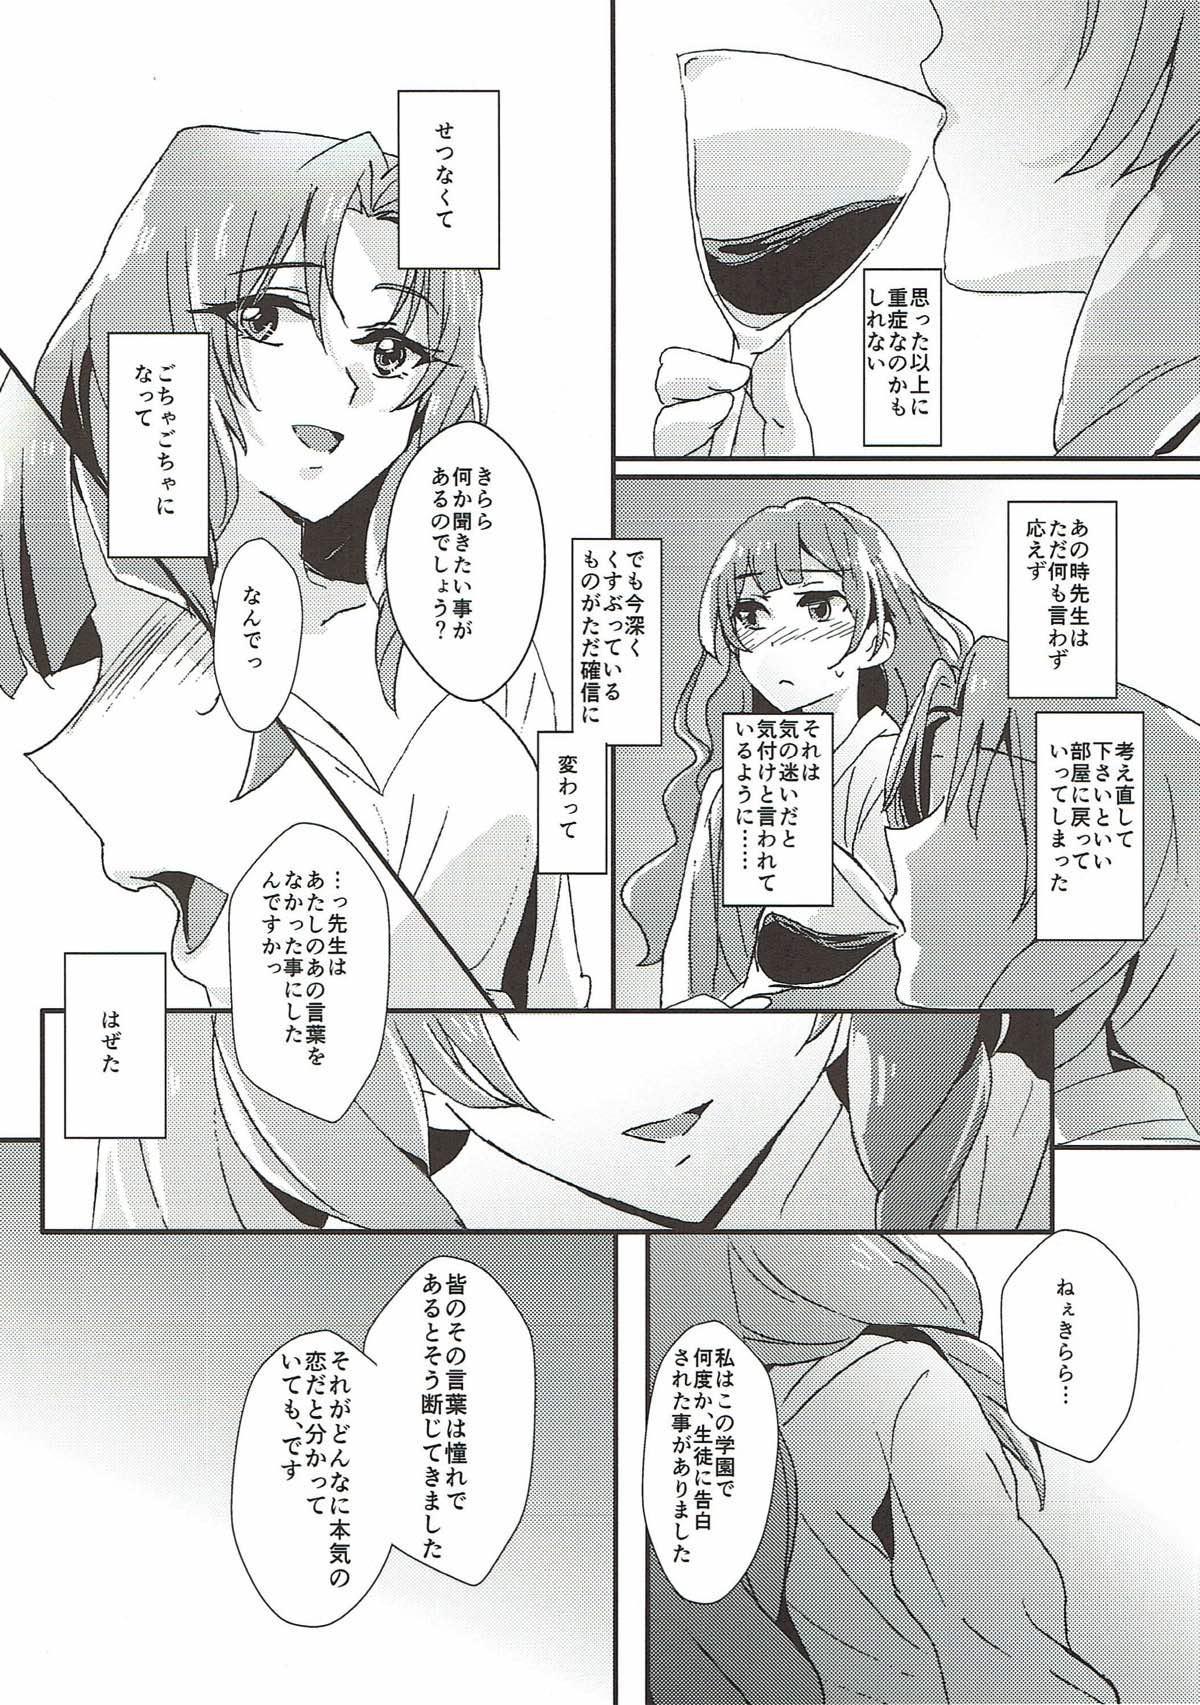 Sensei to Atashi 42